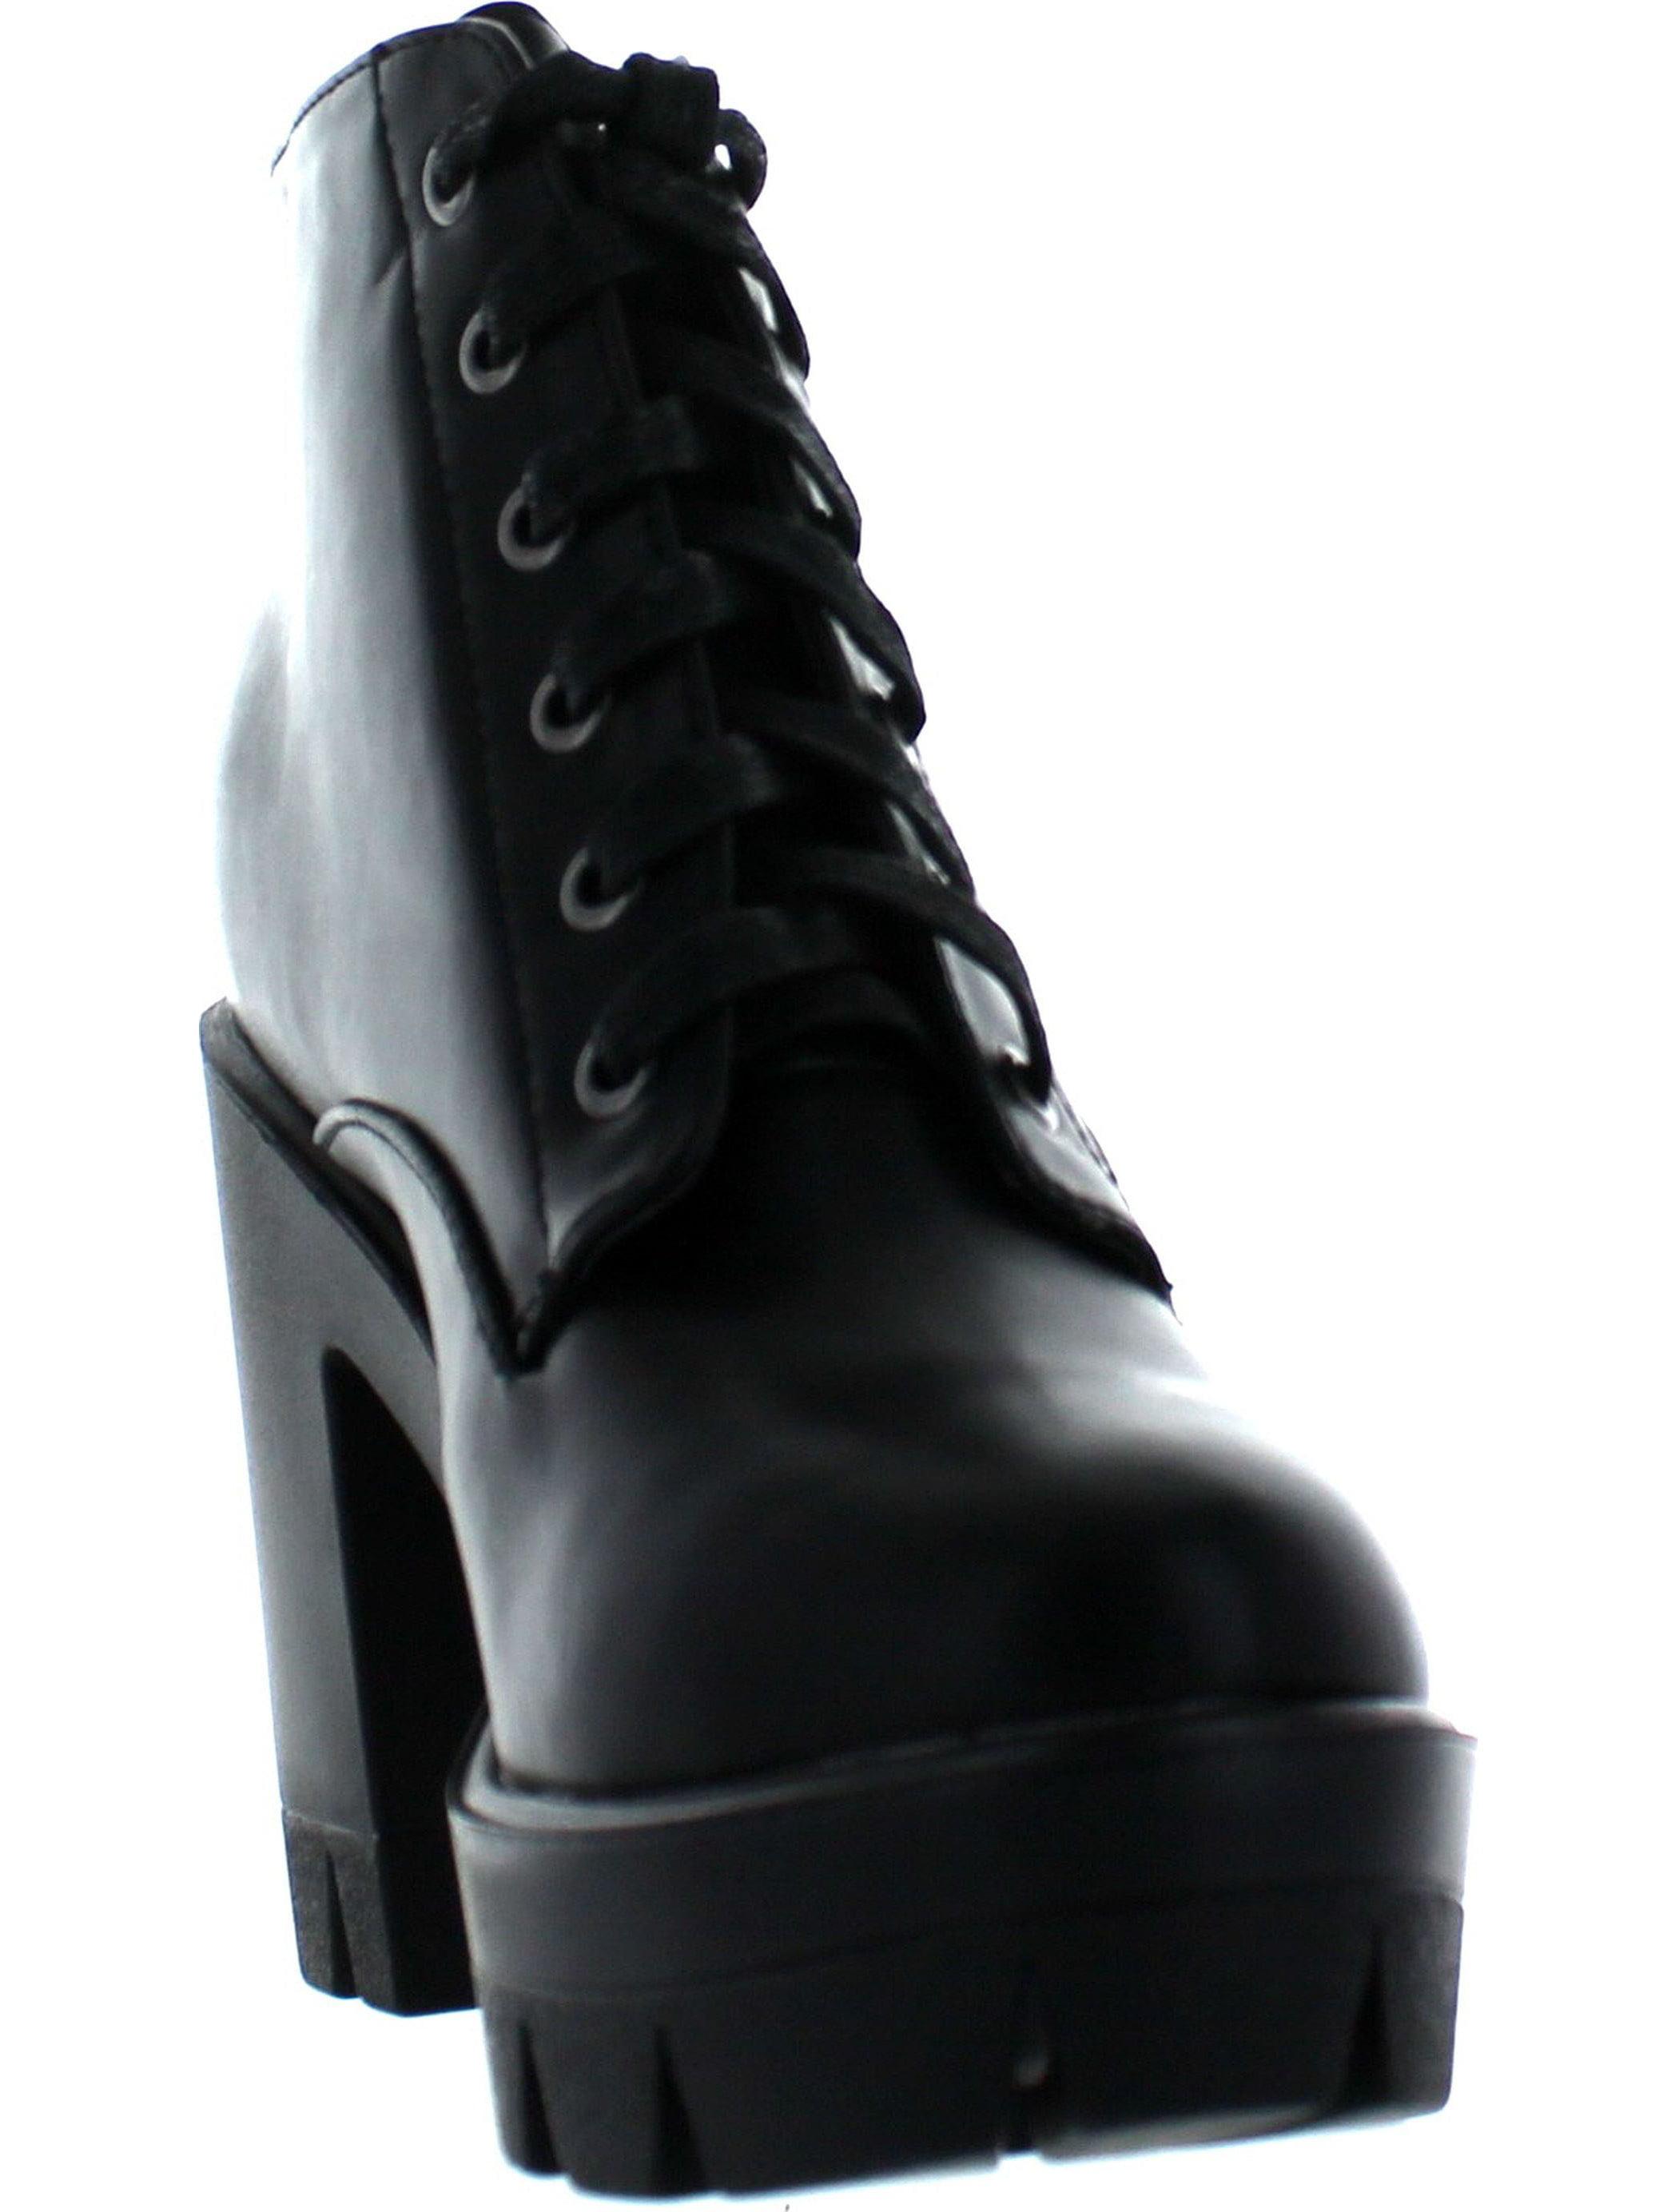 b089999593f3 Bamboo - BAMBOO JONAS-02 Women Lace Up Chunky Heel Lug Sole Platform Combat  Ankle Bootie - Walmart.com